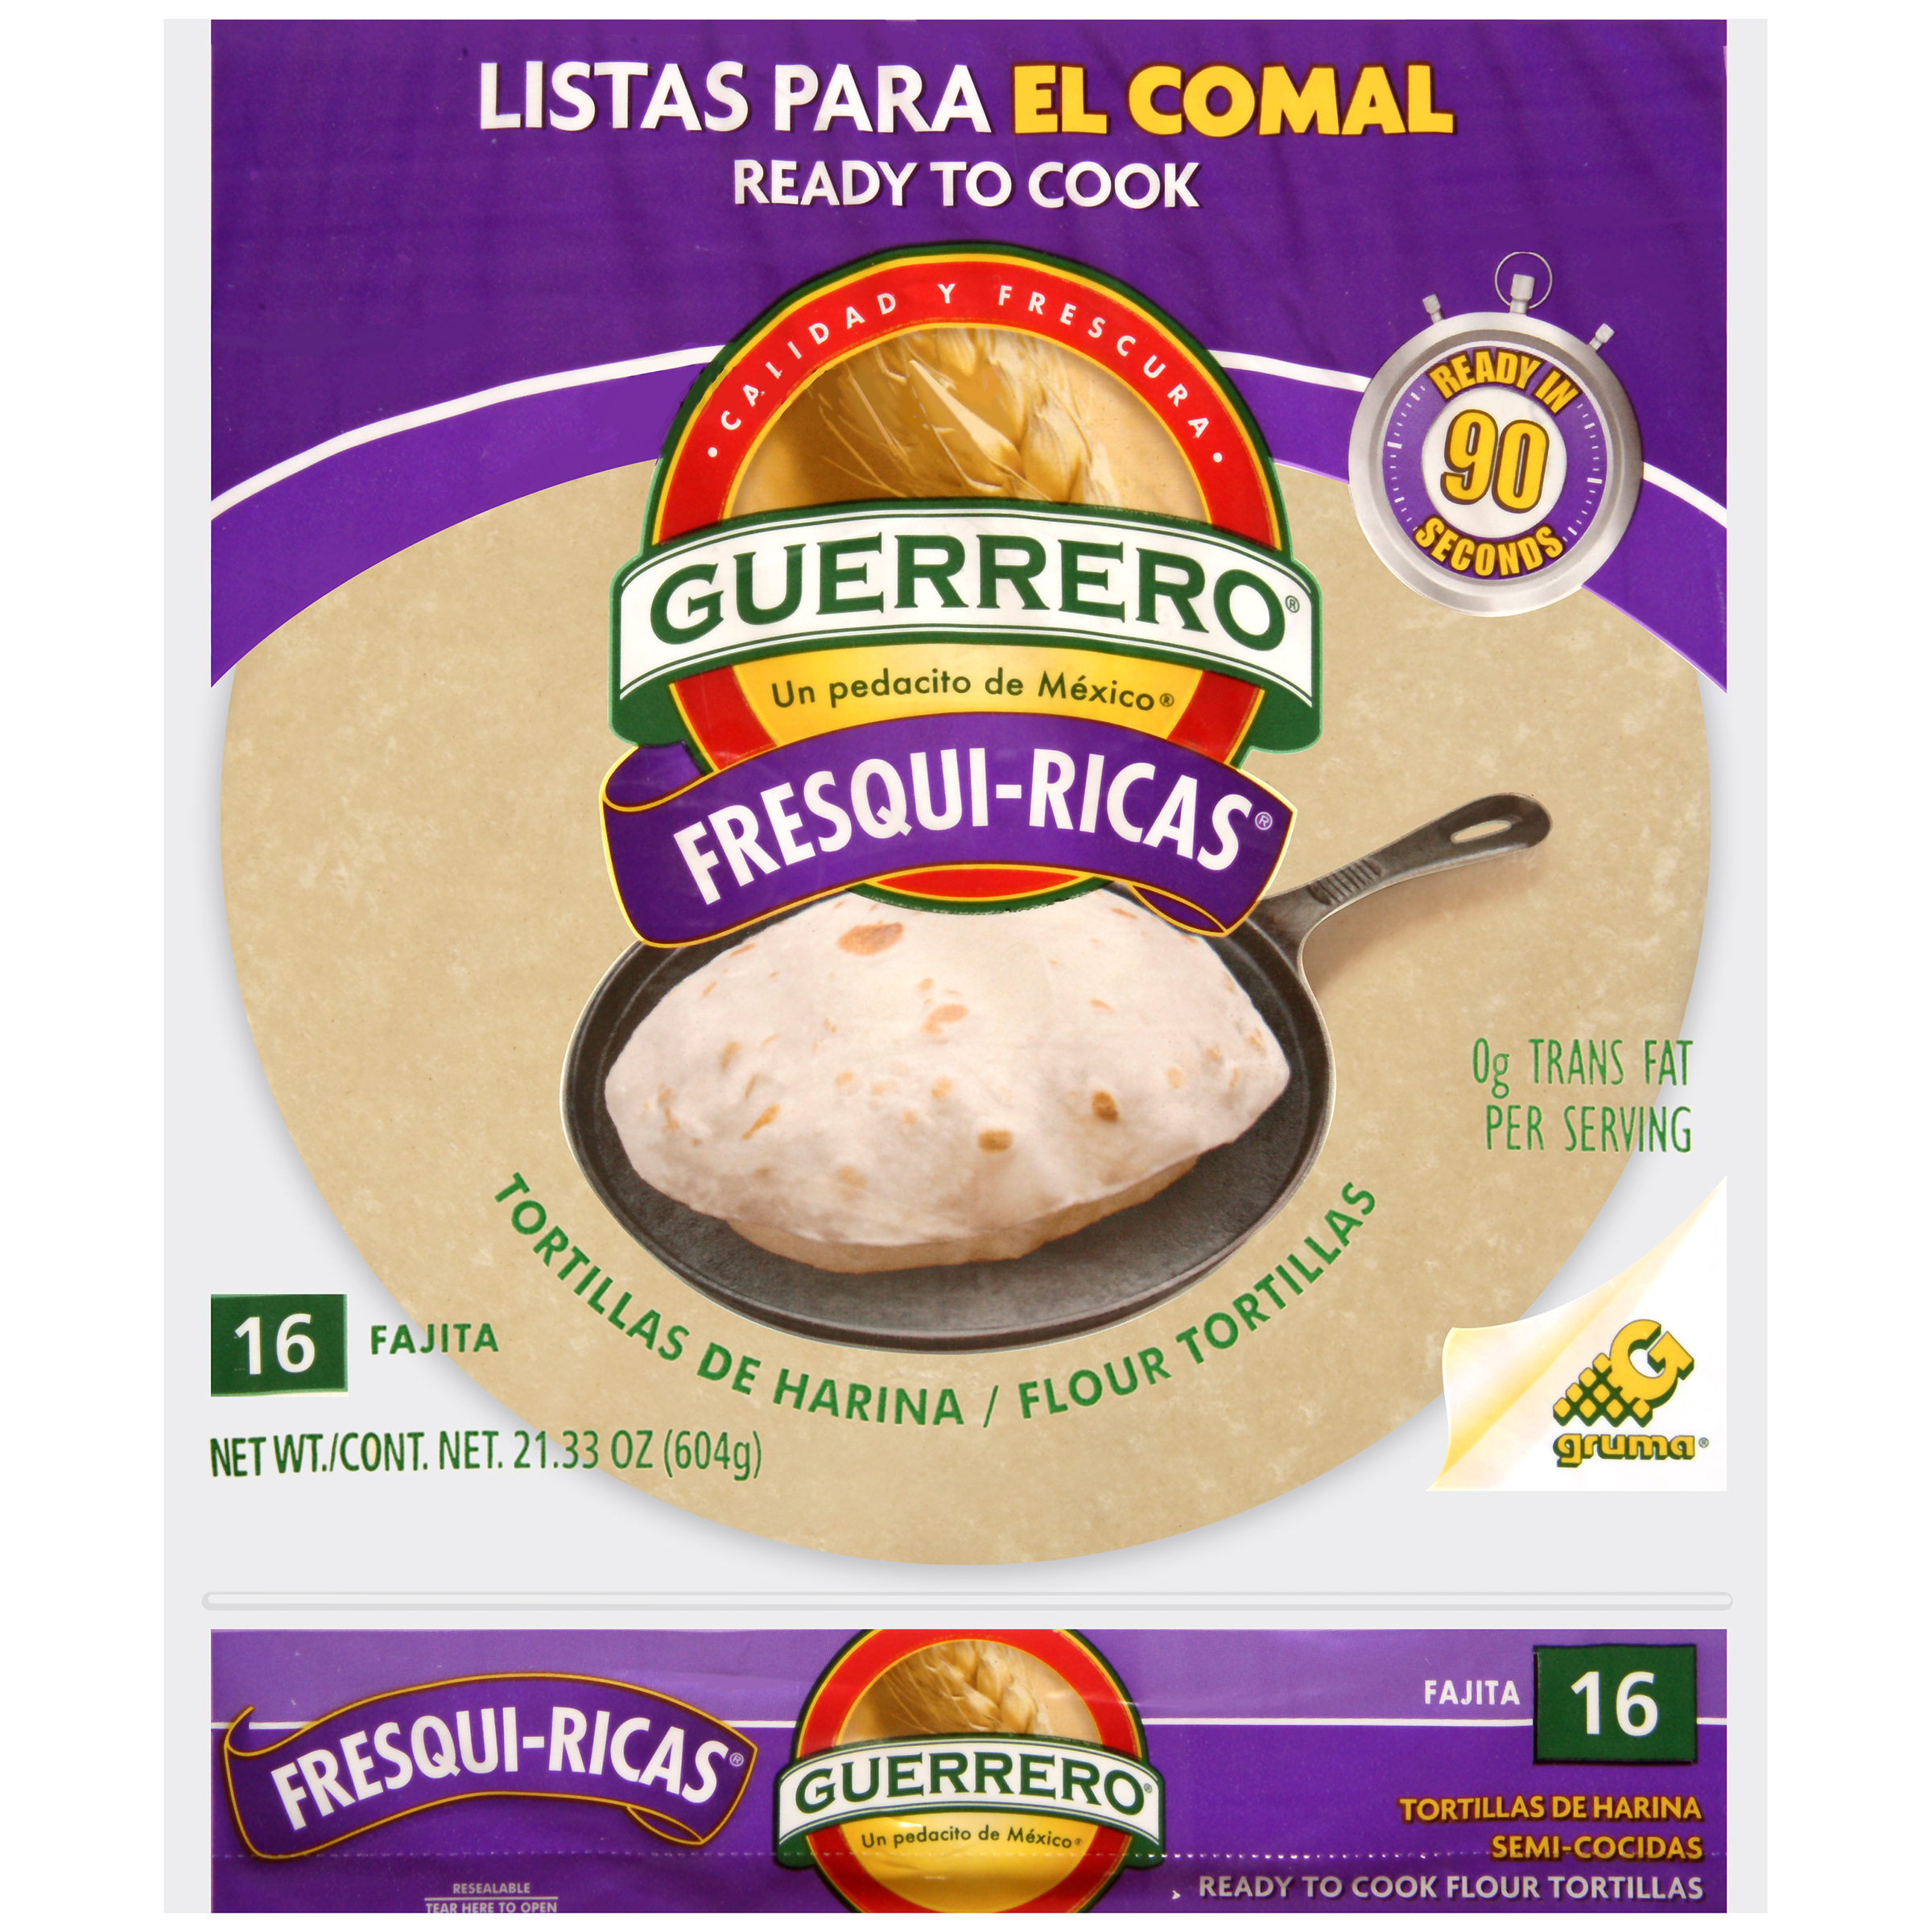 Guerrero Pre-Cooked Flour Fajita Tortillas, 16 ct